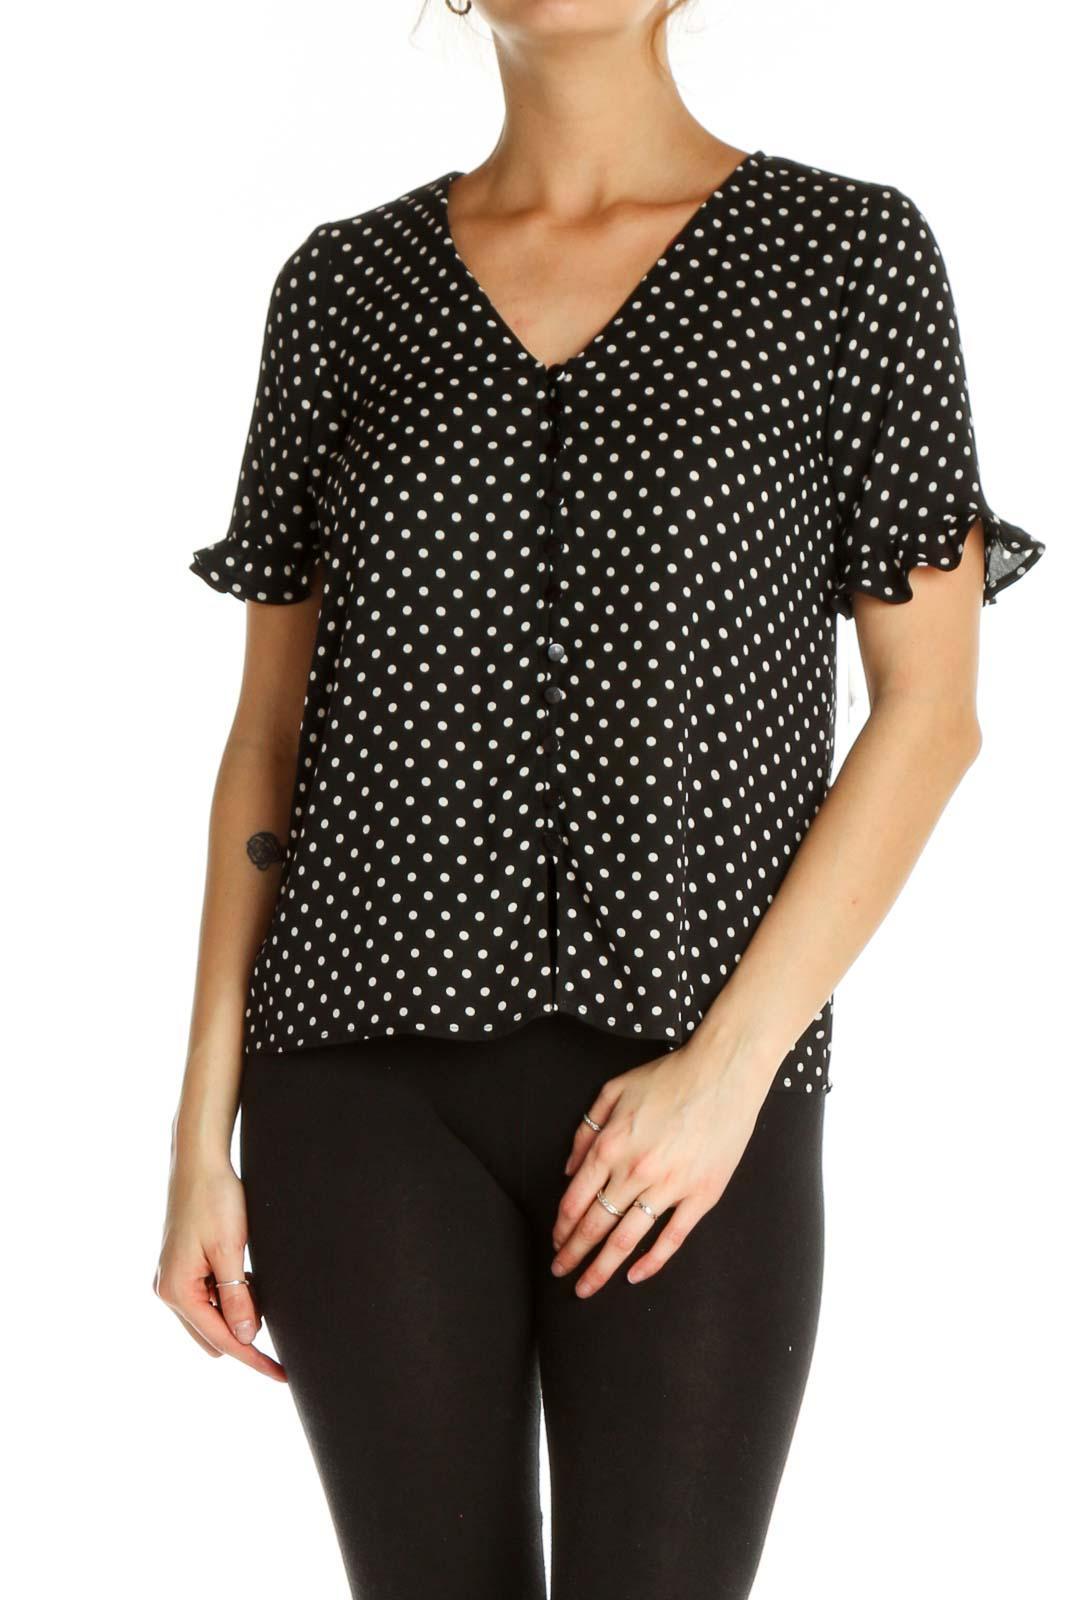 Black Polka Dot All Day Wear T-Shirt Front